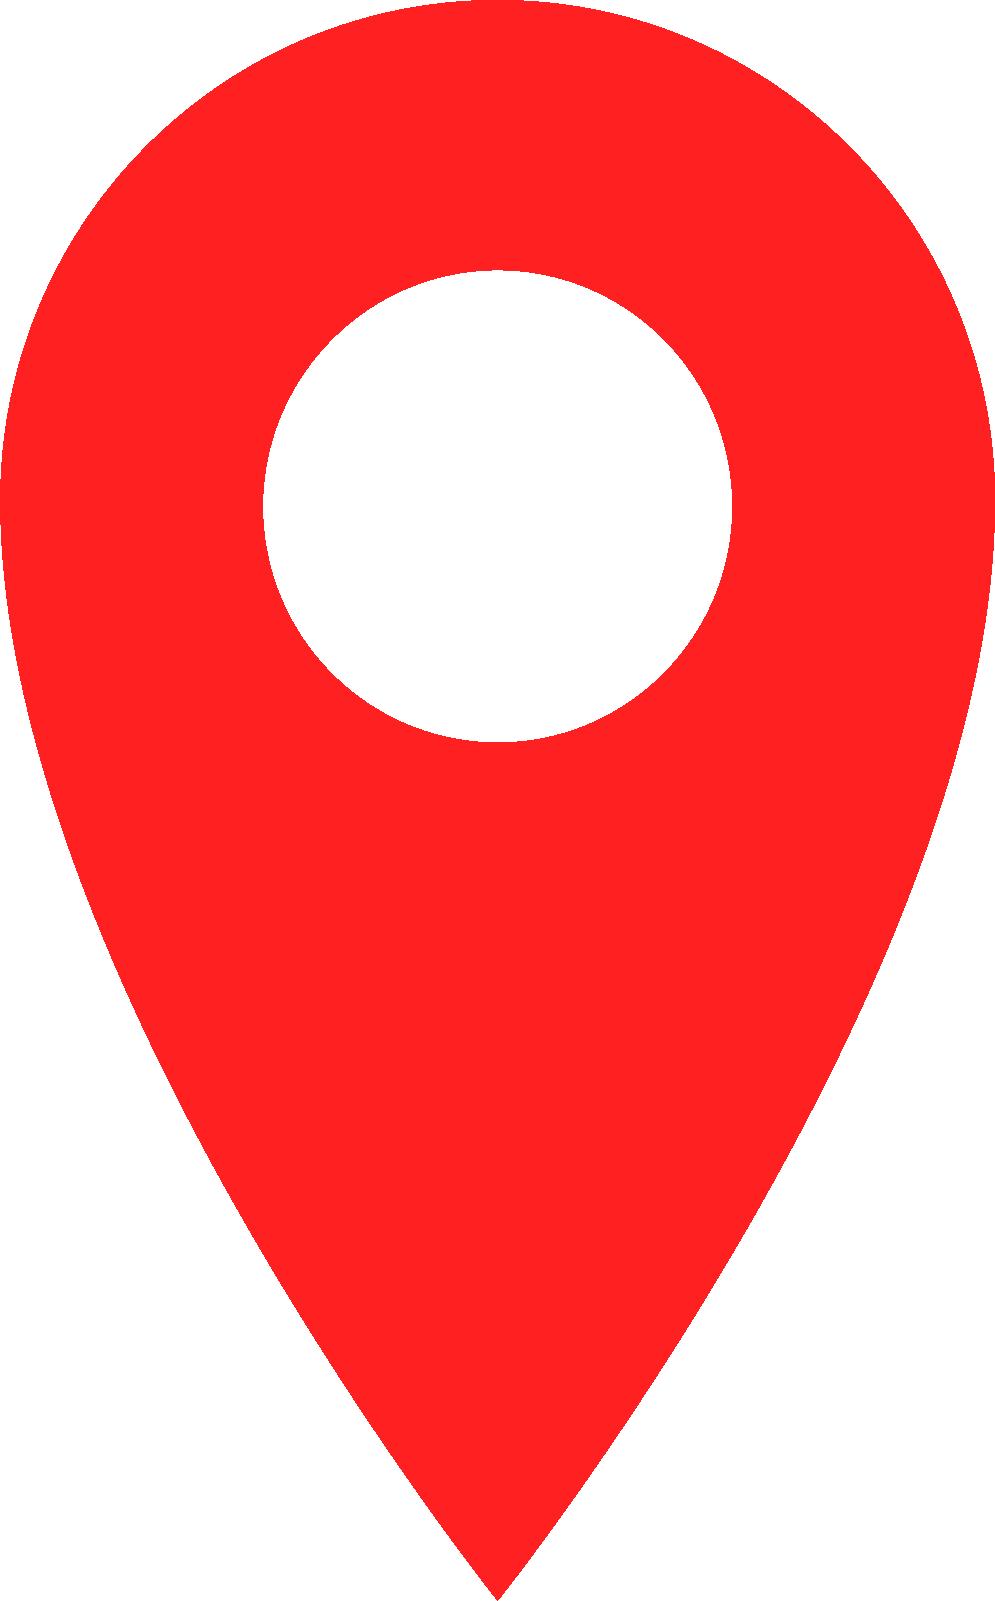 GPS PNG Images Transparent Free Download.